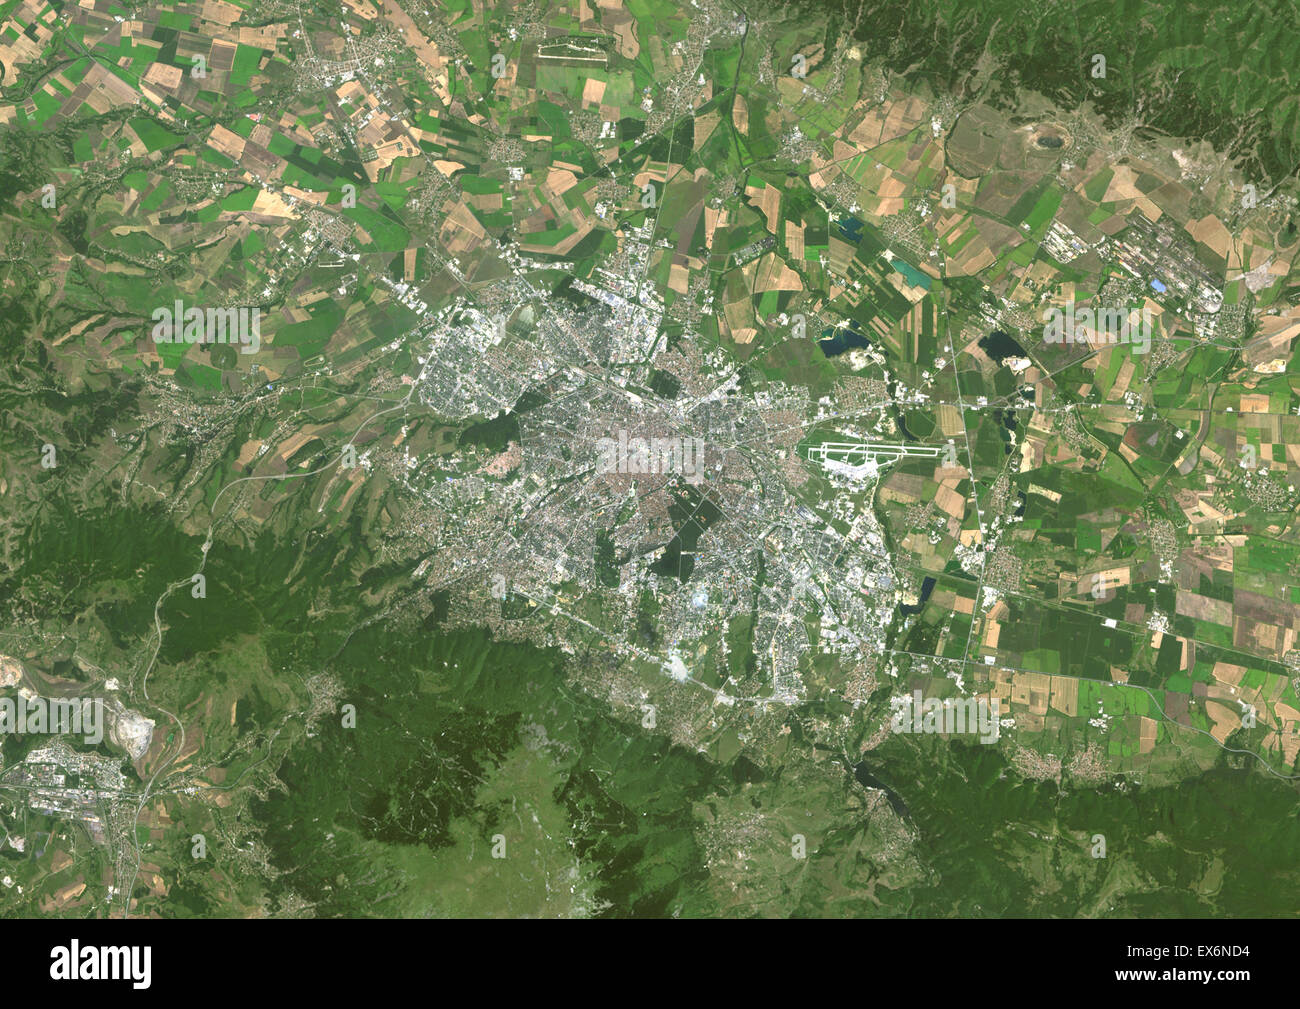 colour satellite image of sofia bulgaria image taken on august 14 2014 with landsat 8 data